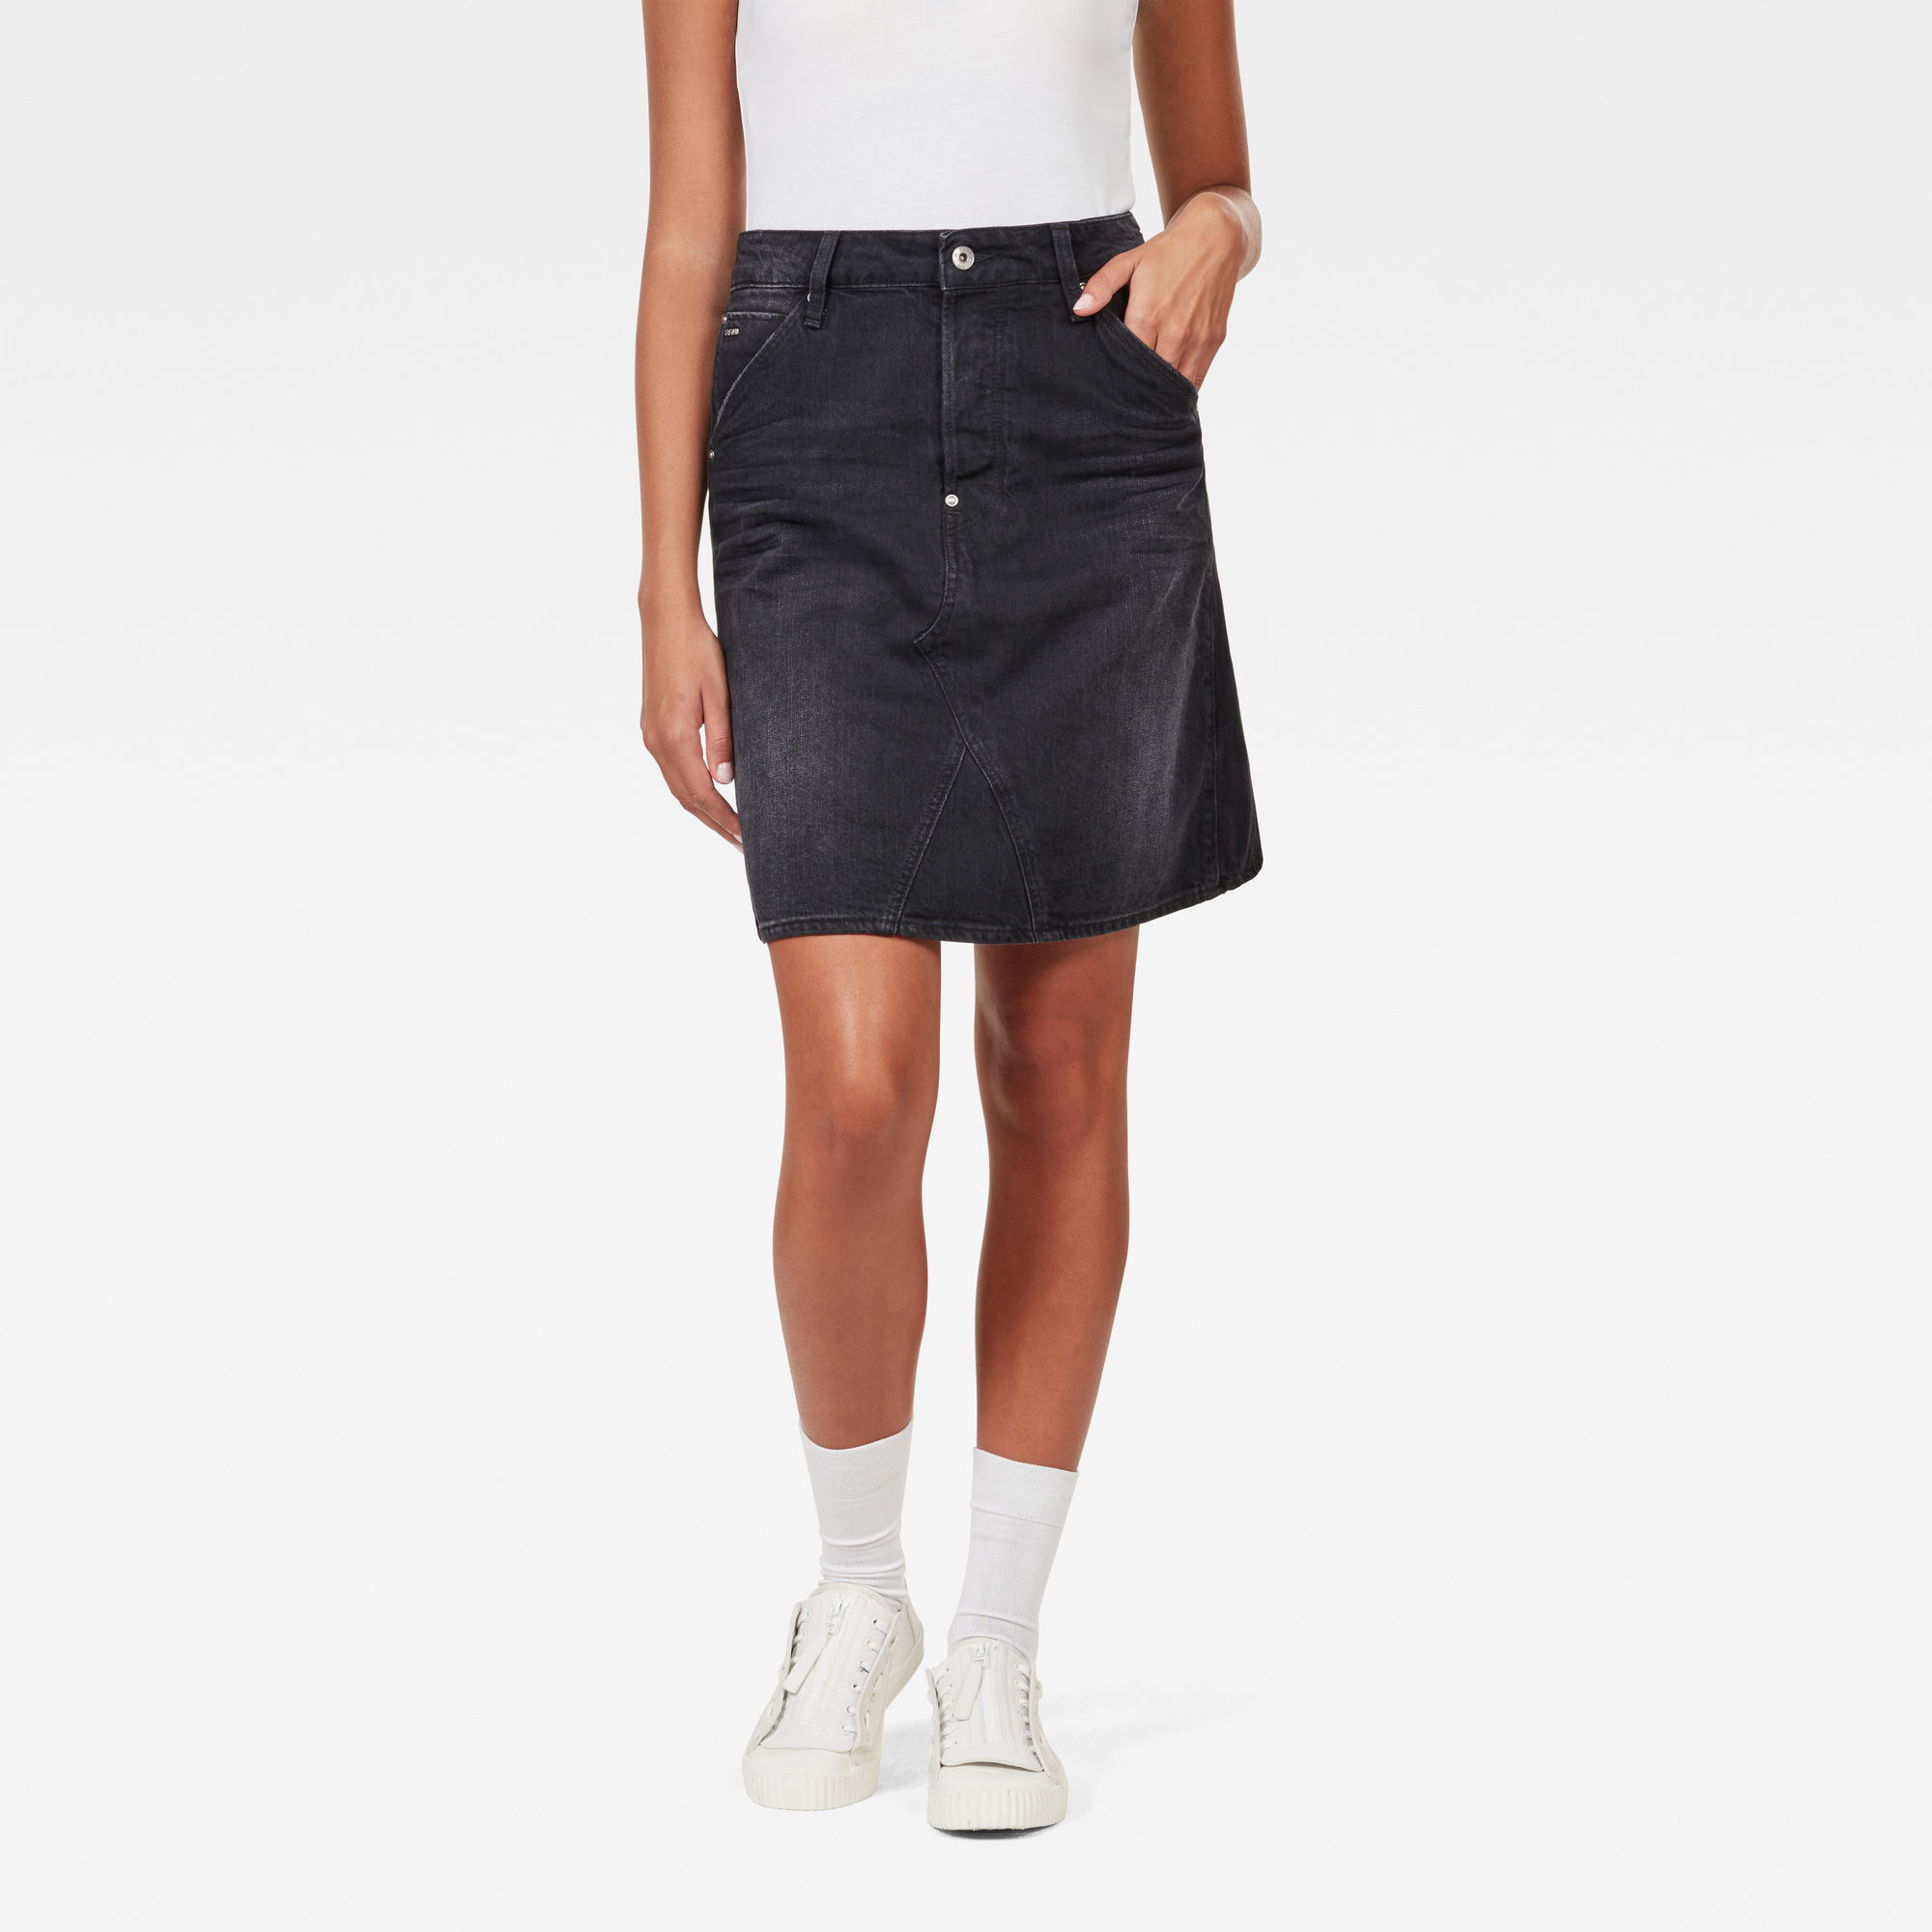 Image of G Star Raw 5622 Skirt